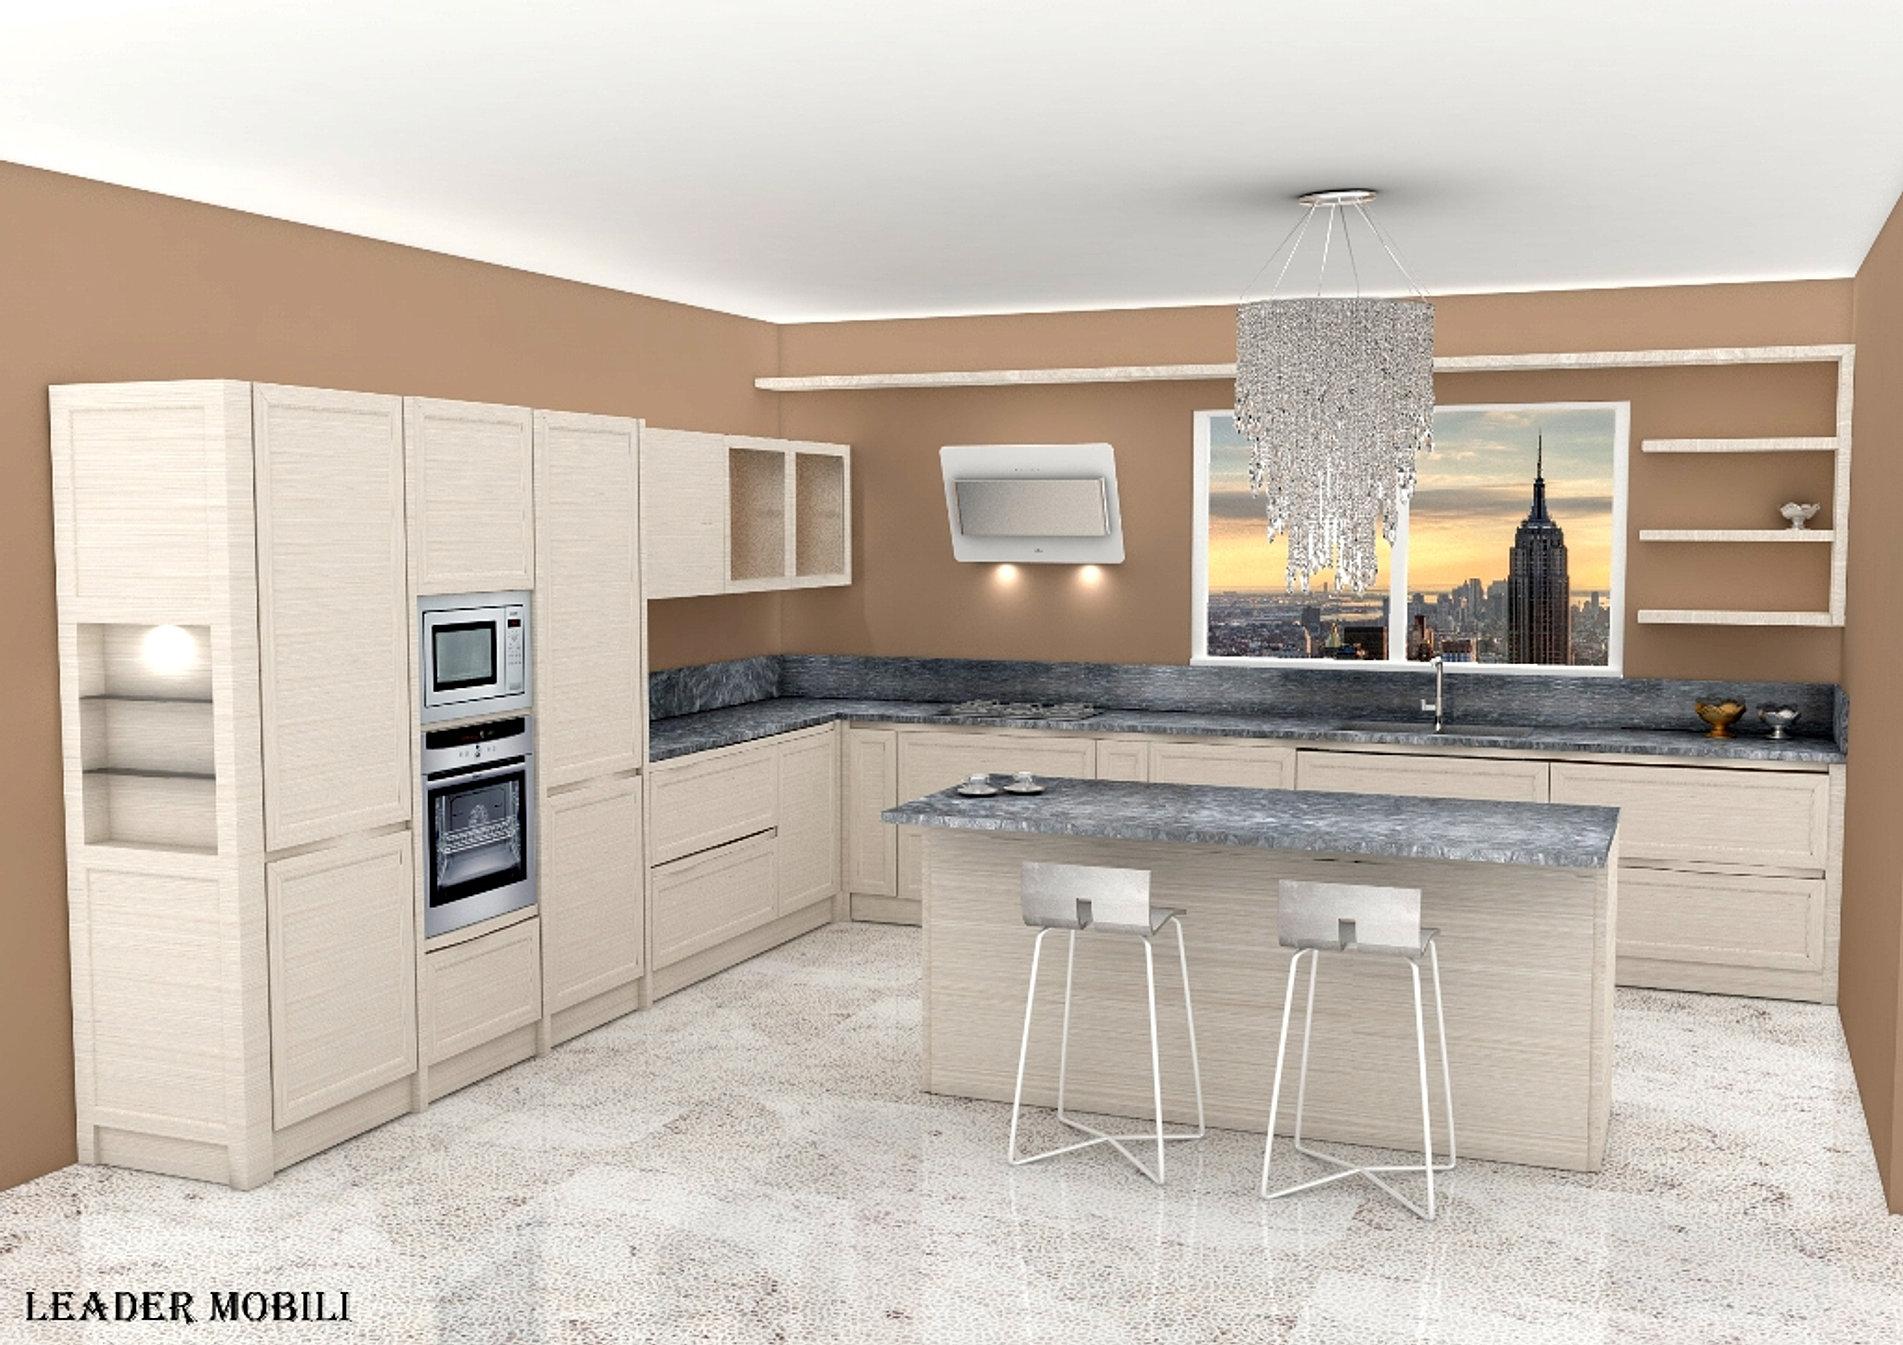 Cucina in legno Eva